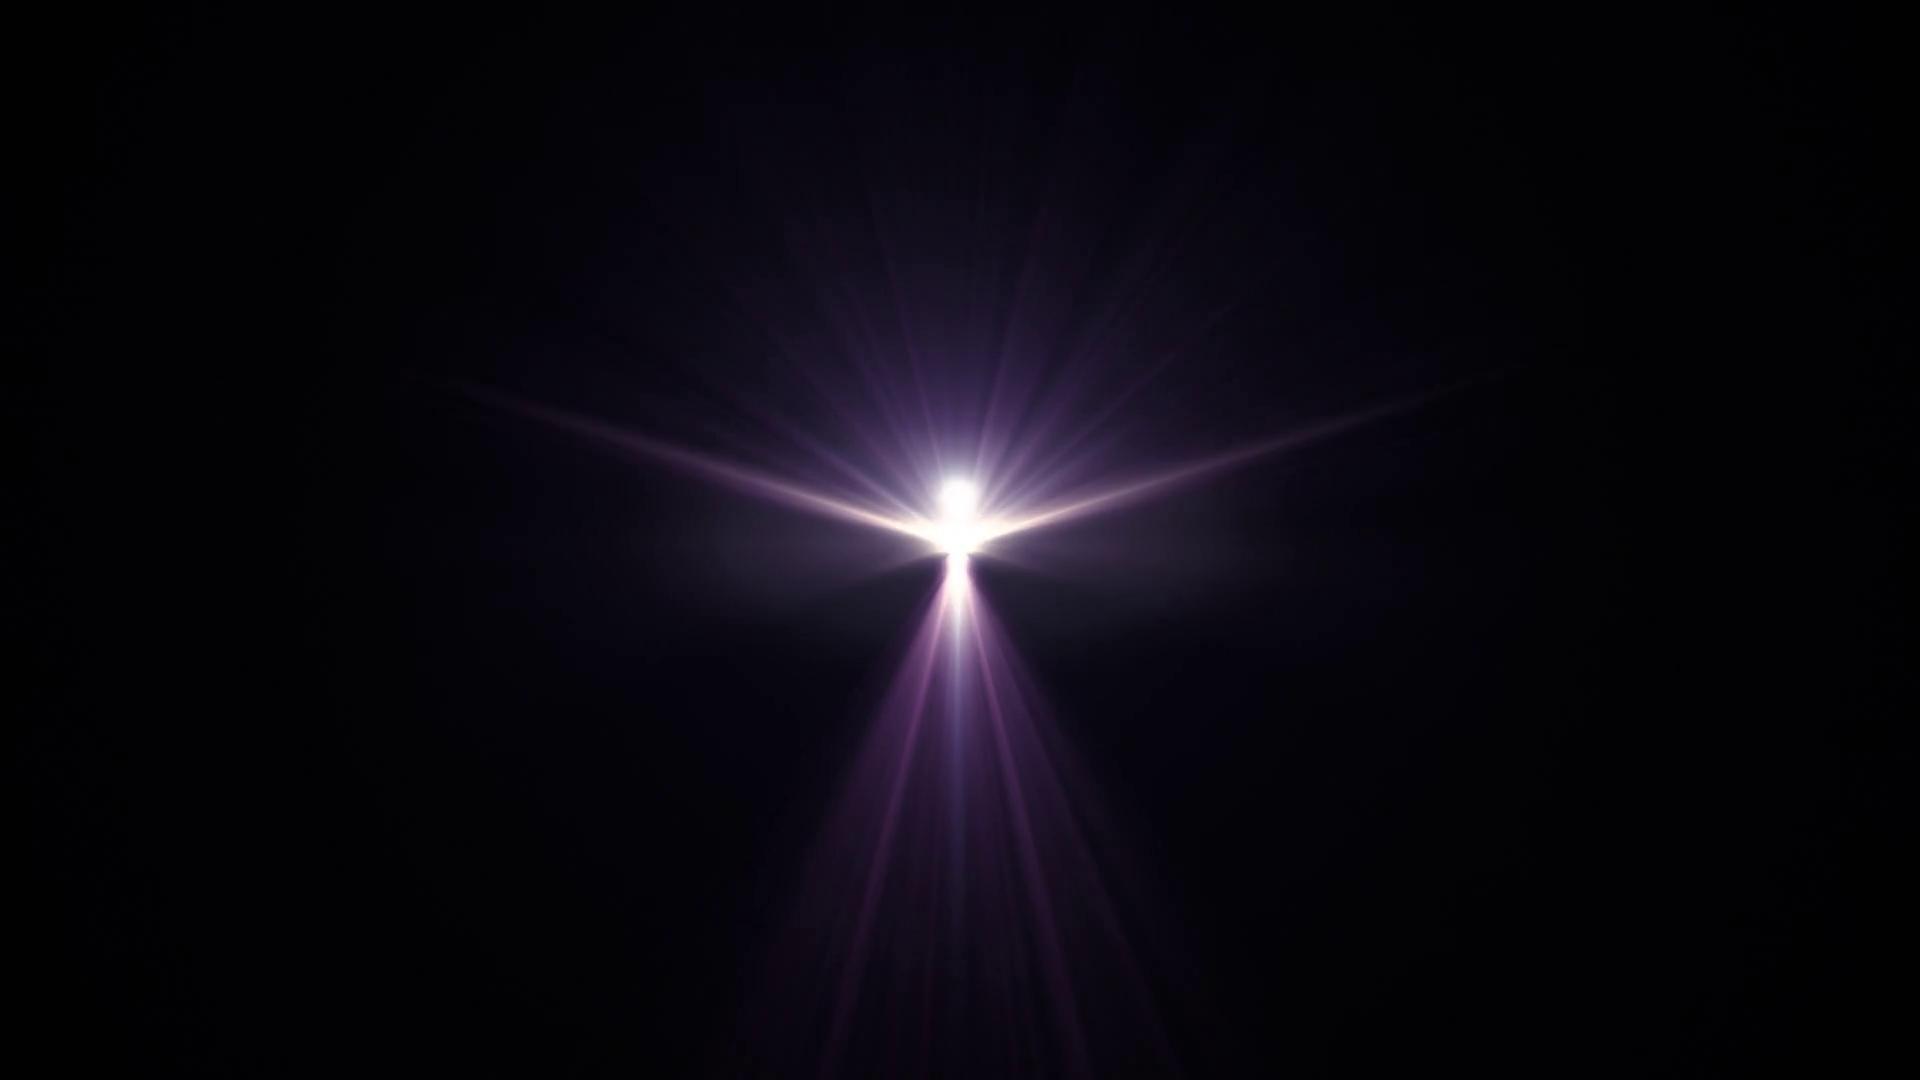 symmetrical bird man explosion flash lights optical lens flares ...